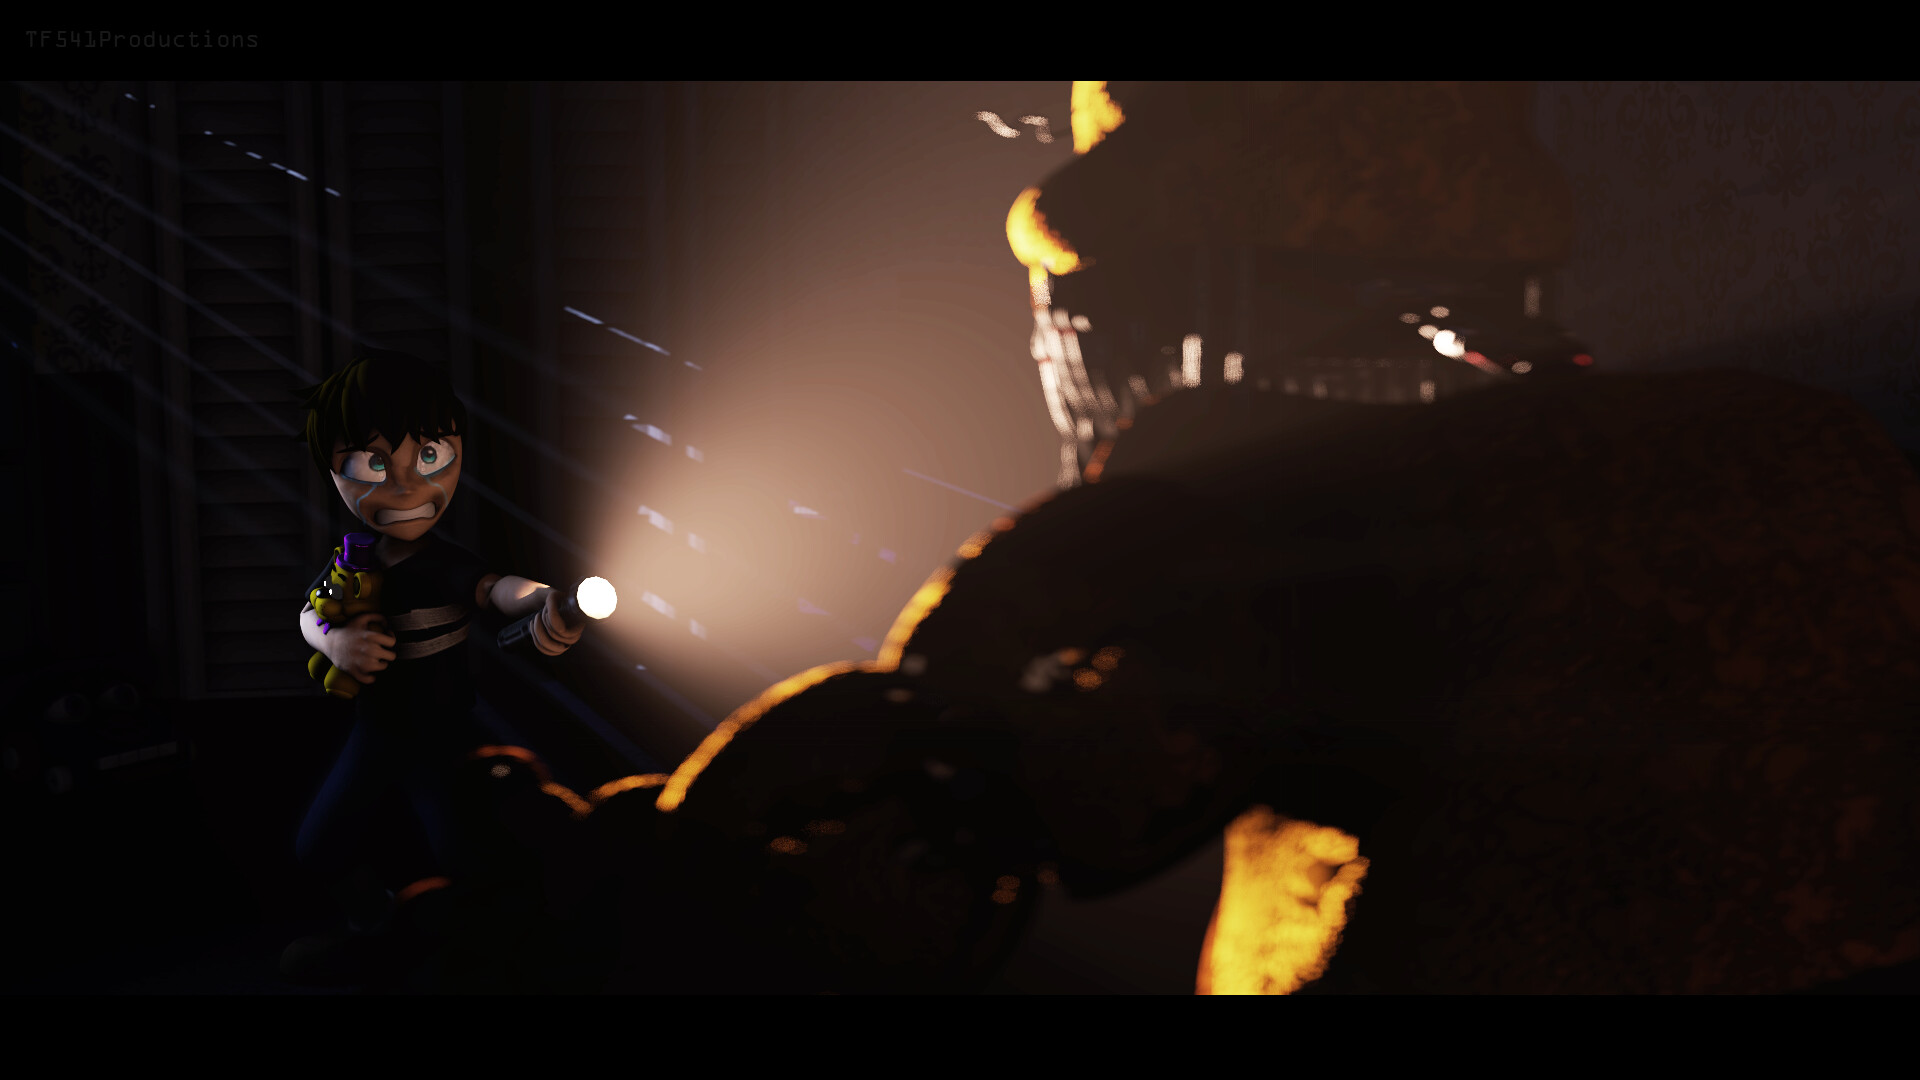 ArtStation - Five Nights at Freddy's 4 - Character Model